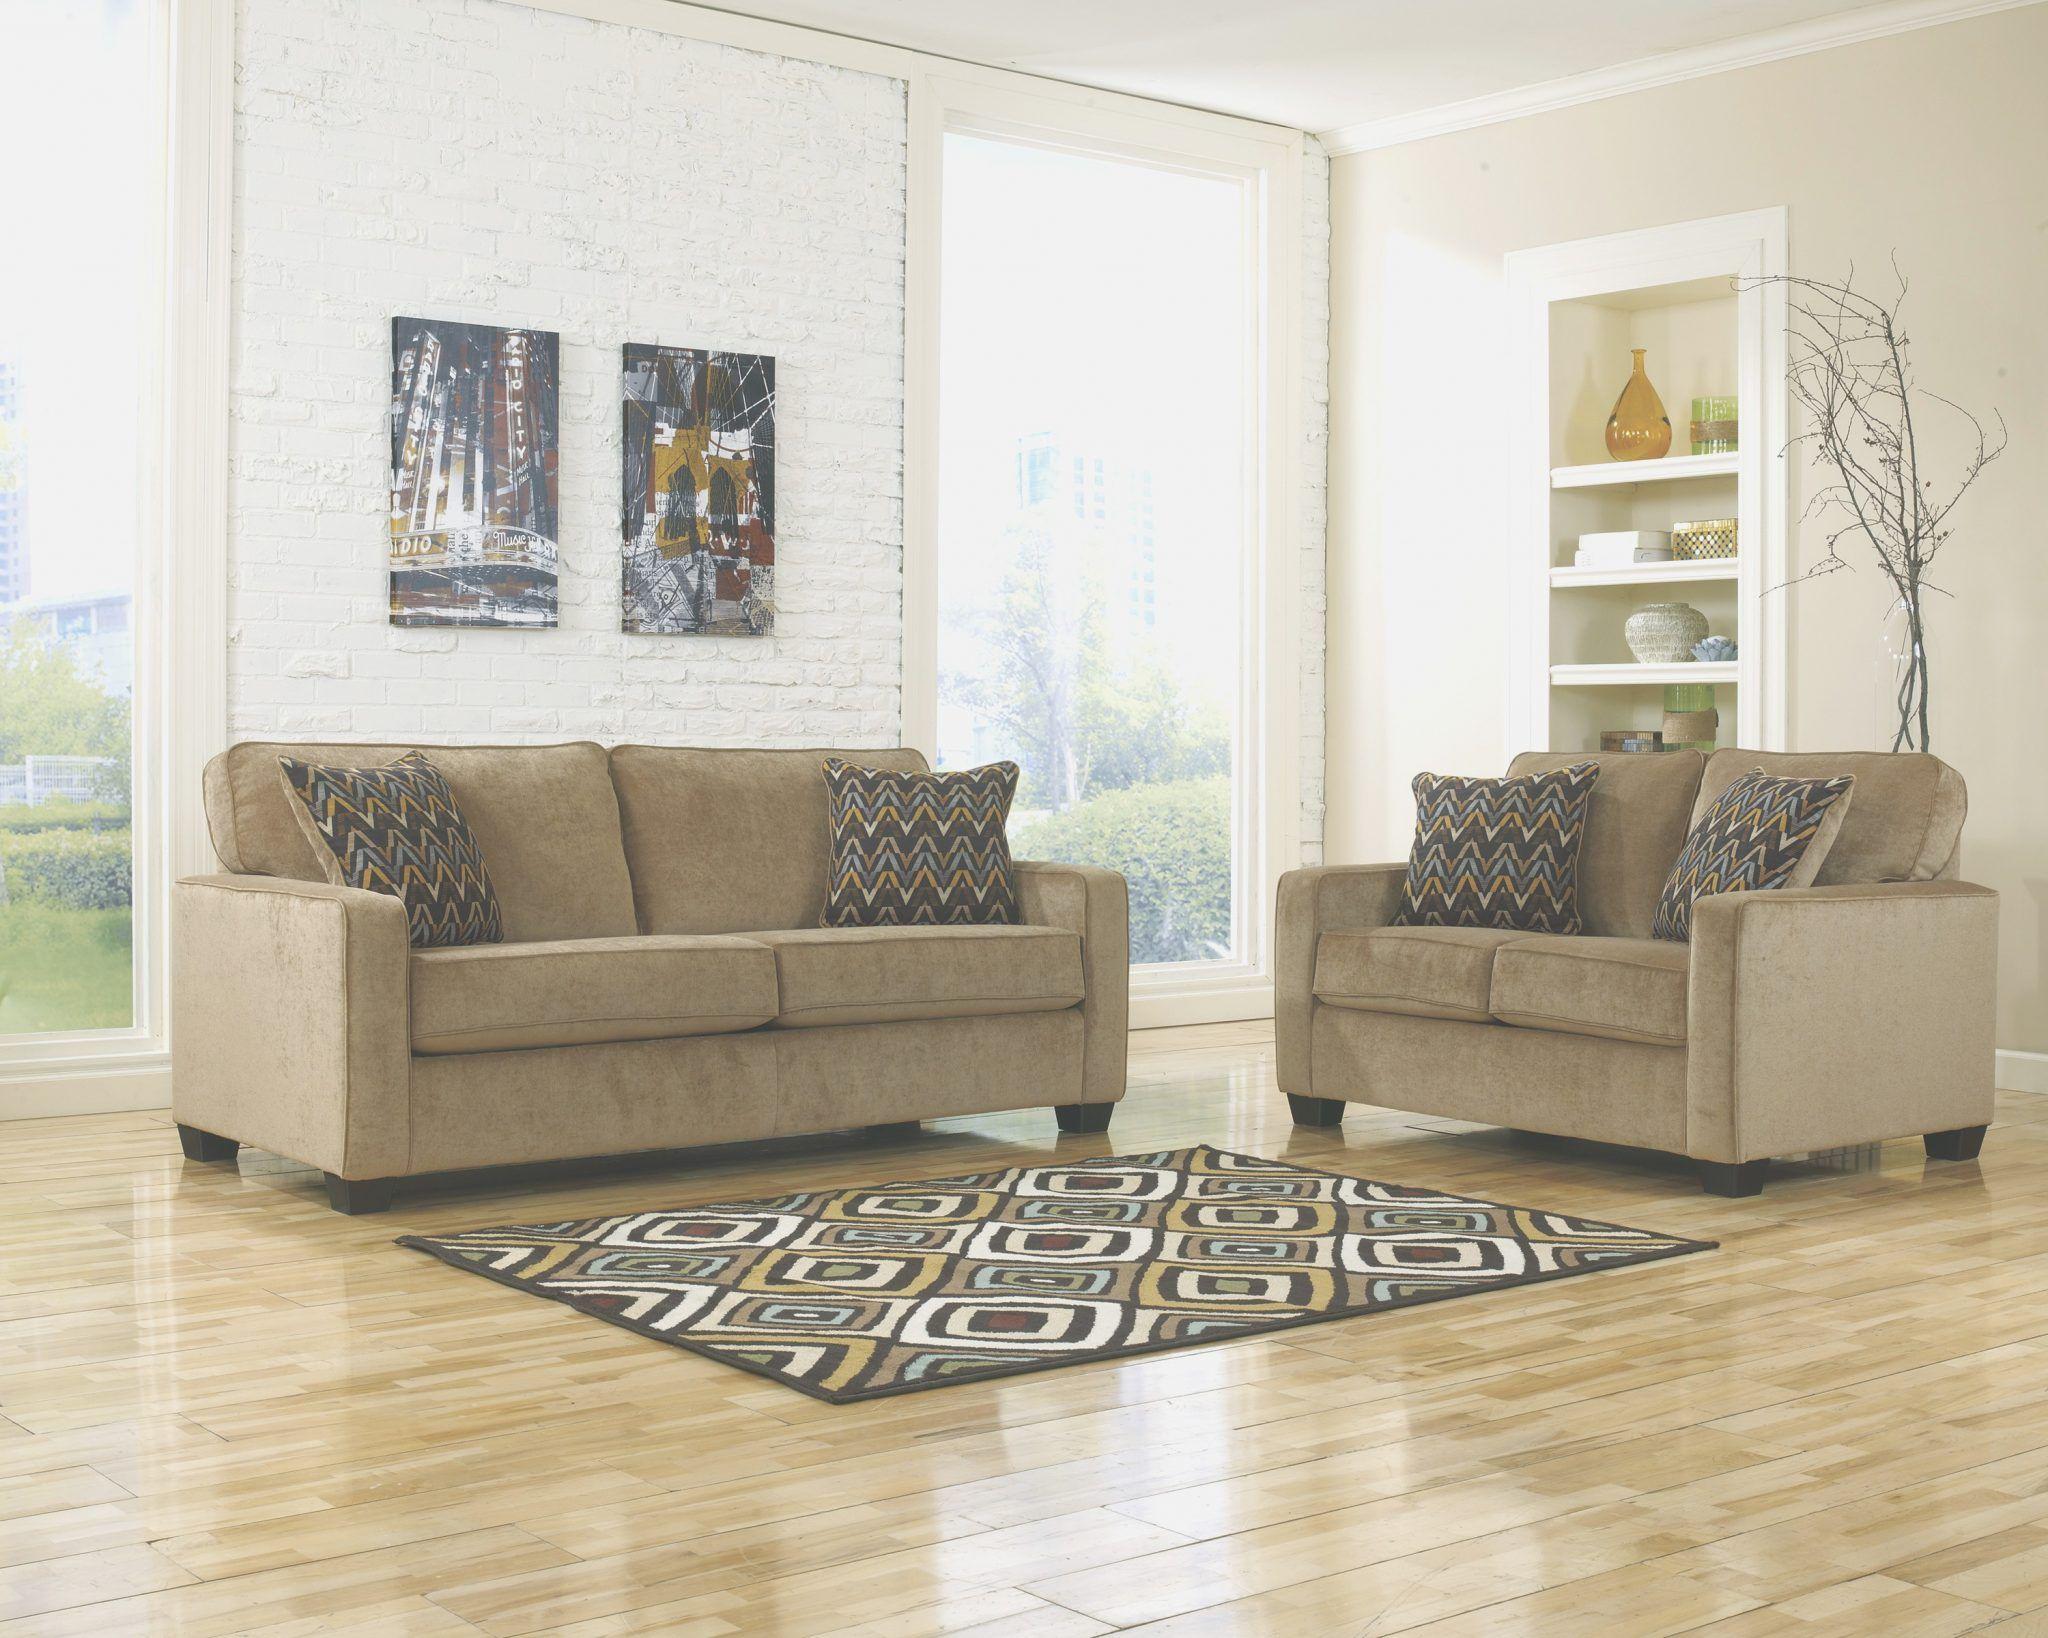 Attirant Ashley Furniture Living Room Sets 999   Ashley Furniture 14 Piece Living  Room Set 999,